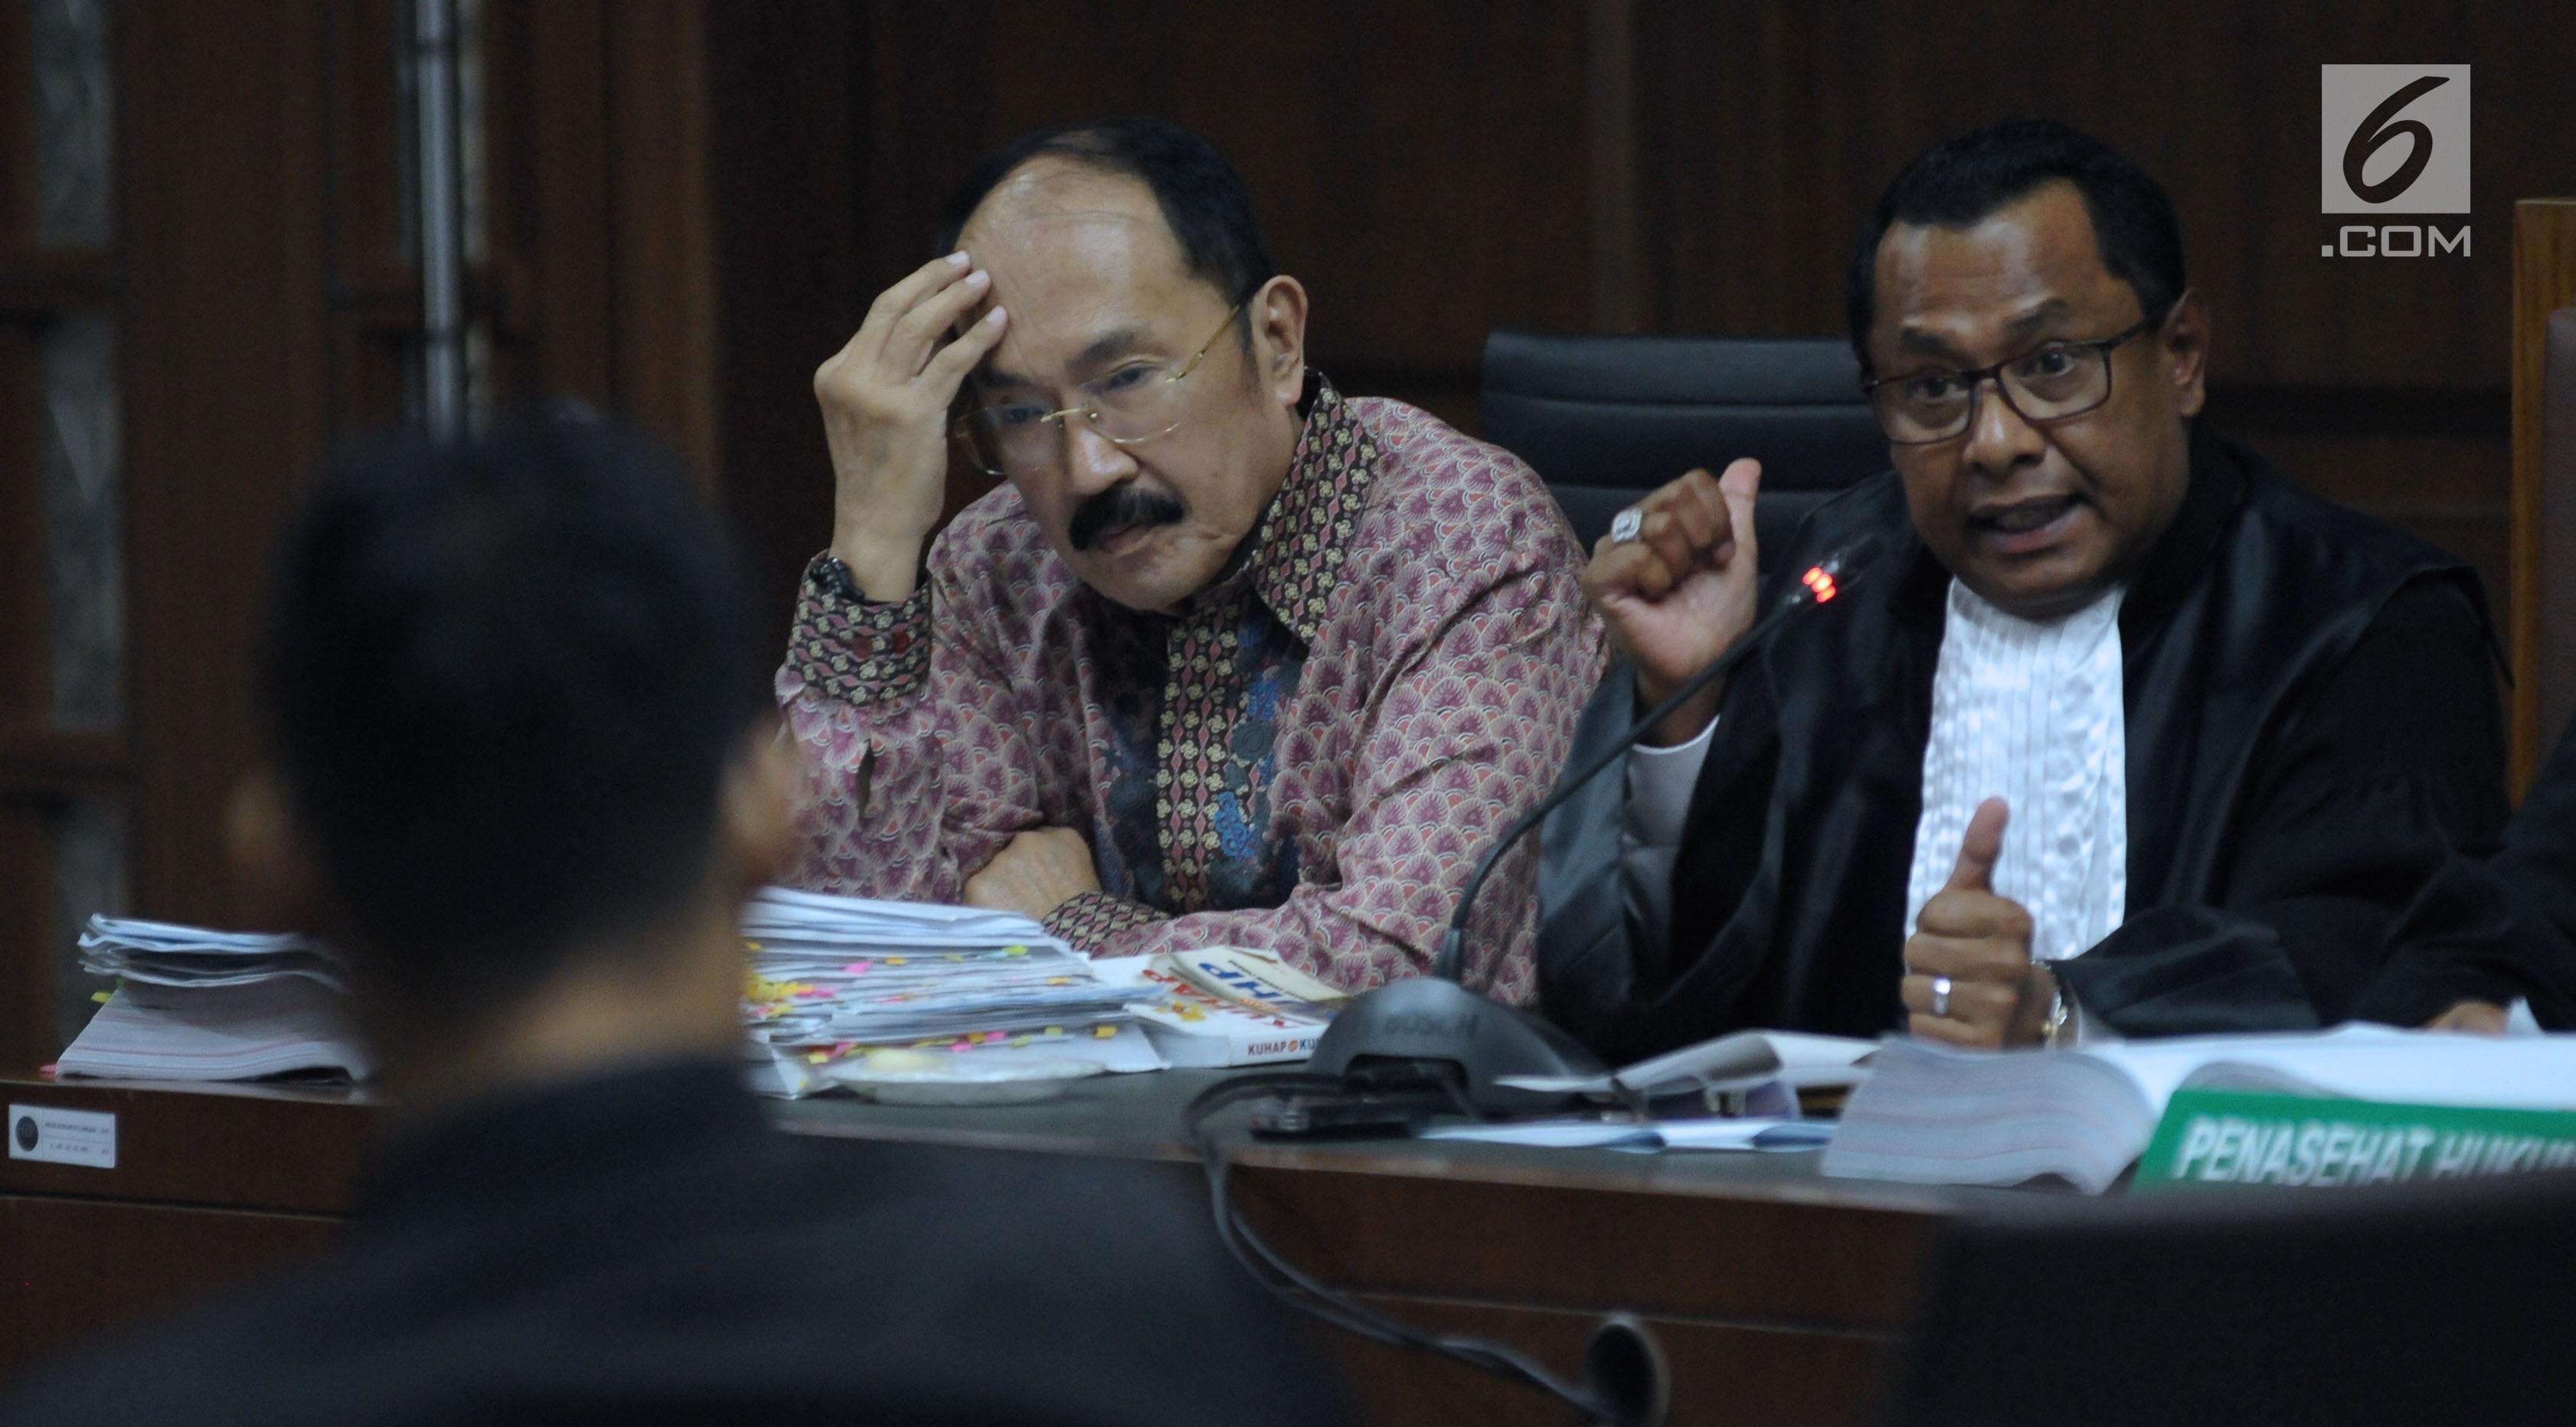 Terdakwa kasus merintangi penyidikan dugaan korupsi e-KTP, Fredrich Yunadi (kiri) menymak keterangan stafnya pada sidang lanjutan di Pengadilan Tipikor, Jakarta, Kamis (12/4). Sidang mendengar keterangan saksi. (Liputan6.com/Helmi Fithriansyah)